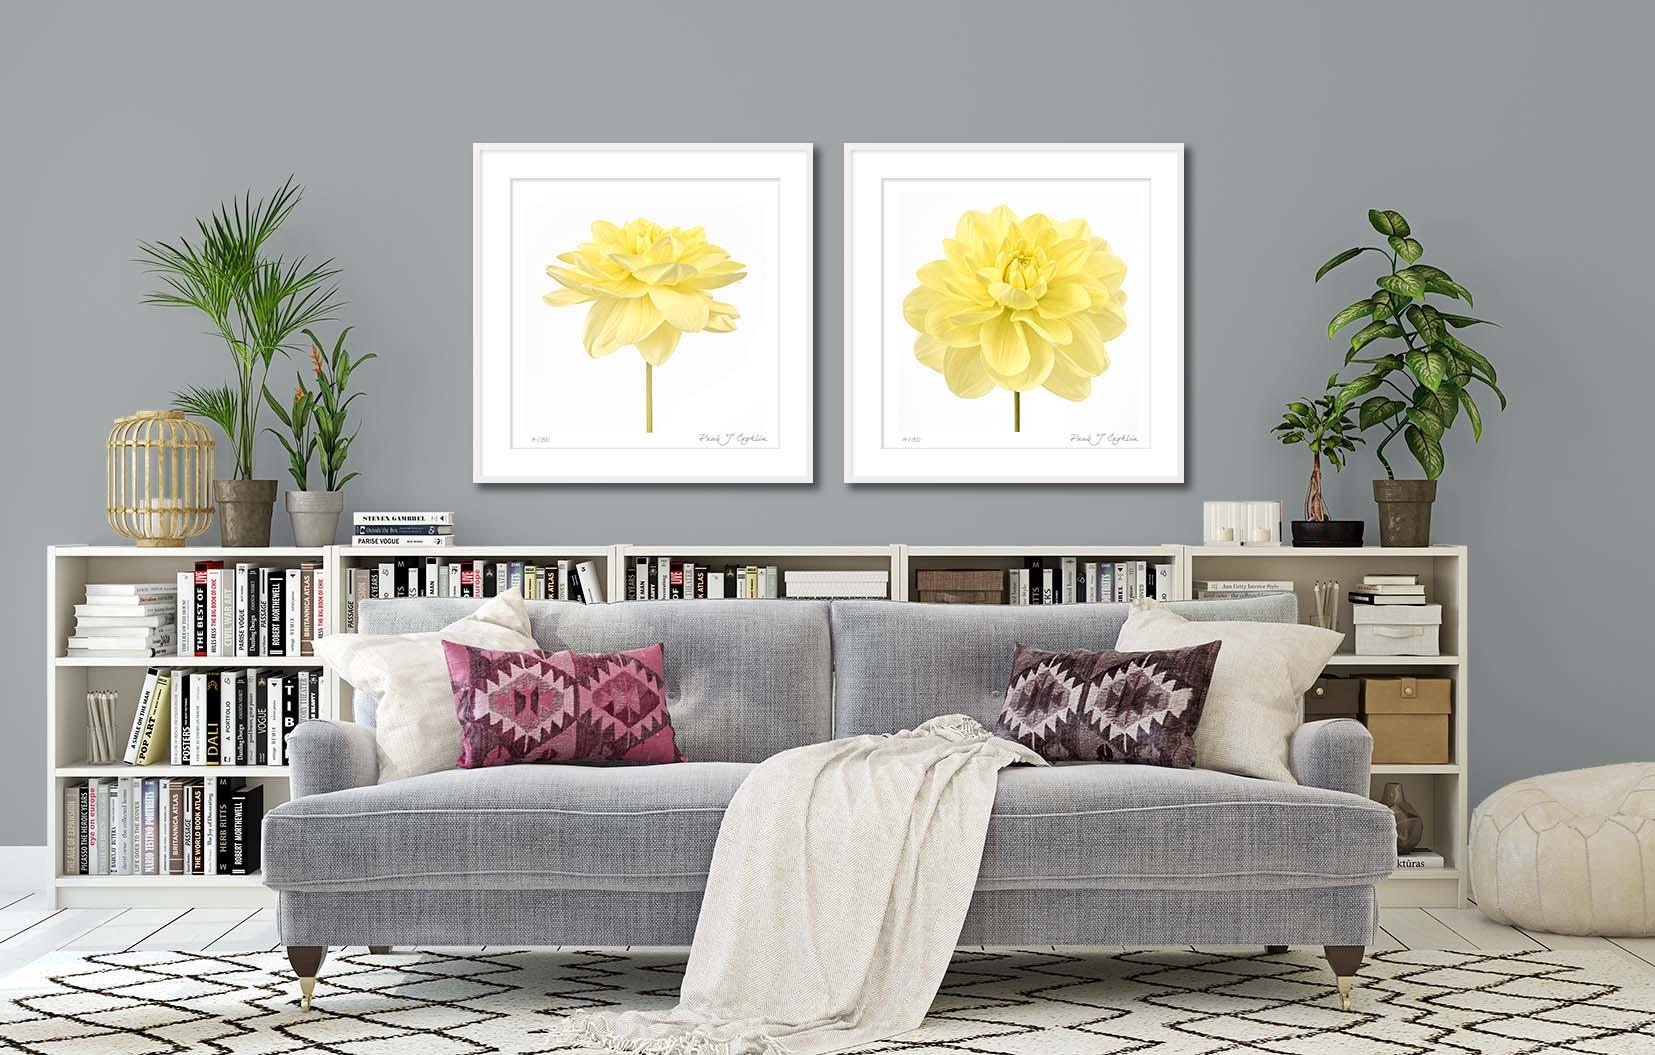 Dahlia 'Glorie van Heemstede' I + II. Limited edition botanical studies of a bright yellow dahlia by fine art photographer Paul Coghlin.